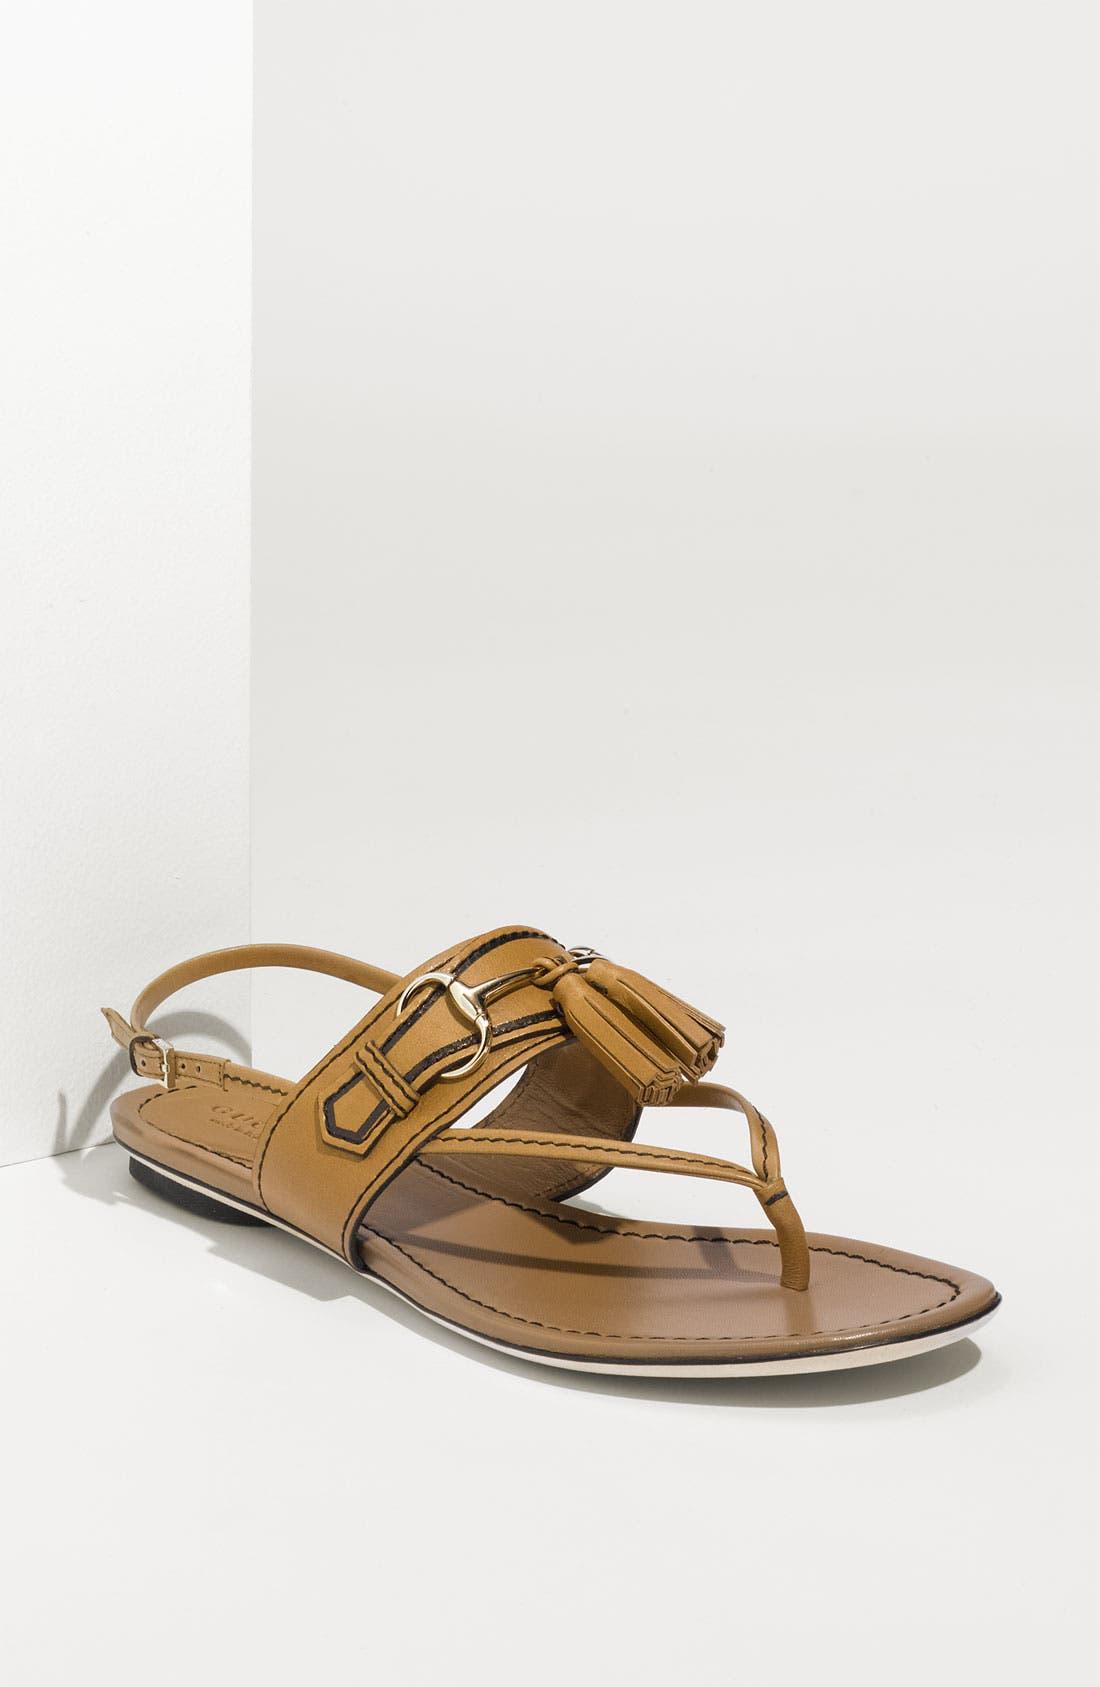 Main Image - Gucci 'Emily' Tassel Sandal